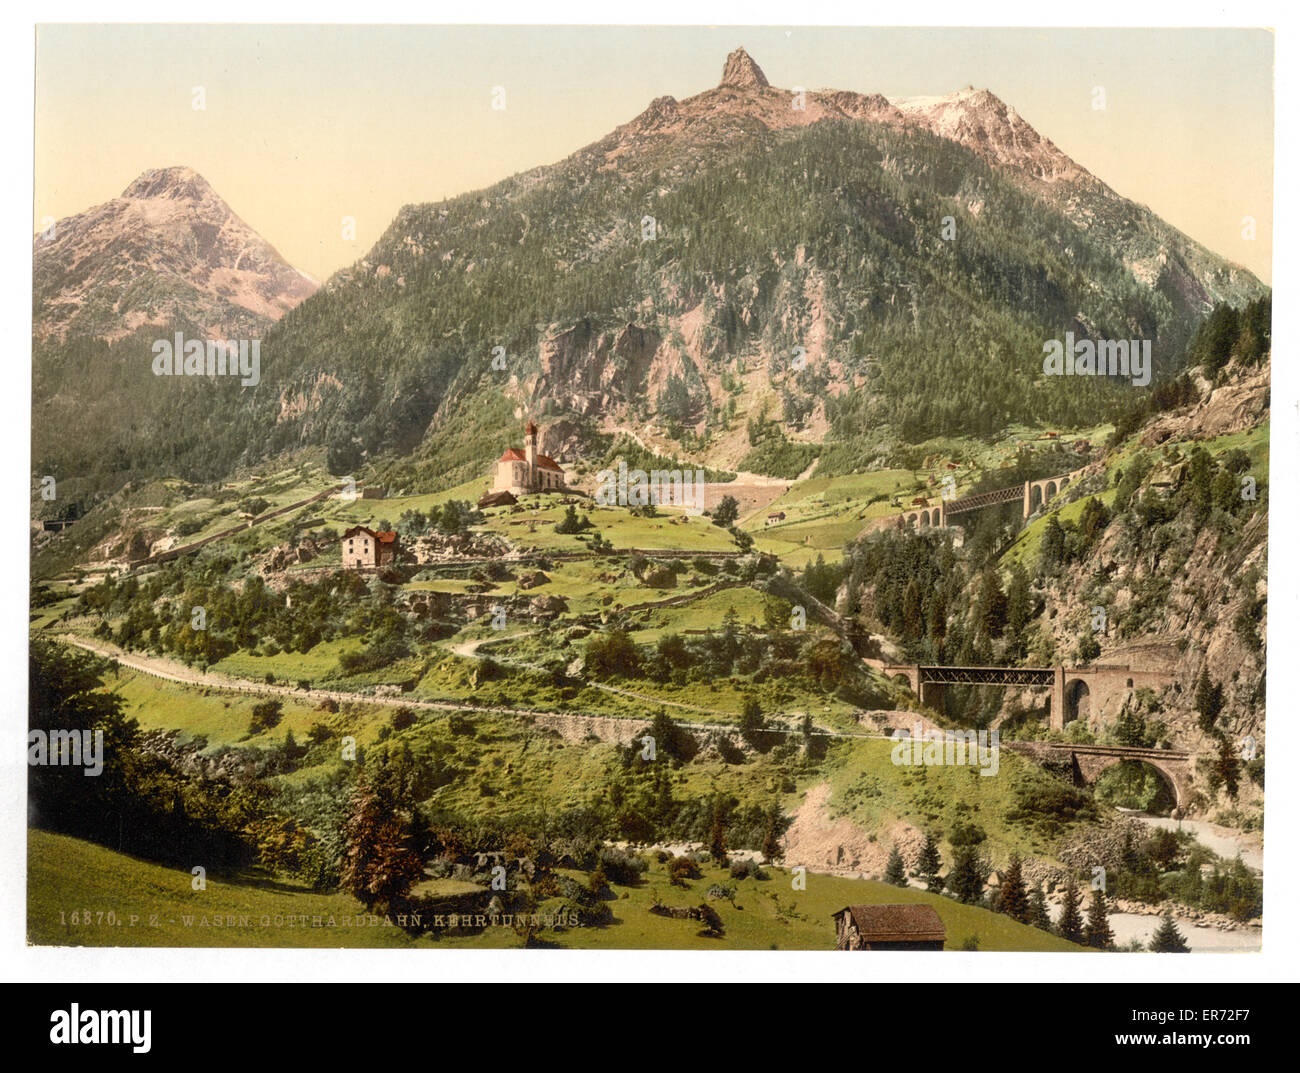 Wassen, the tunnels, St. Gotthard Railway, Switzerland. Date between ca. 1890 and ca. 1900. Stock Photo